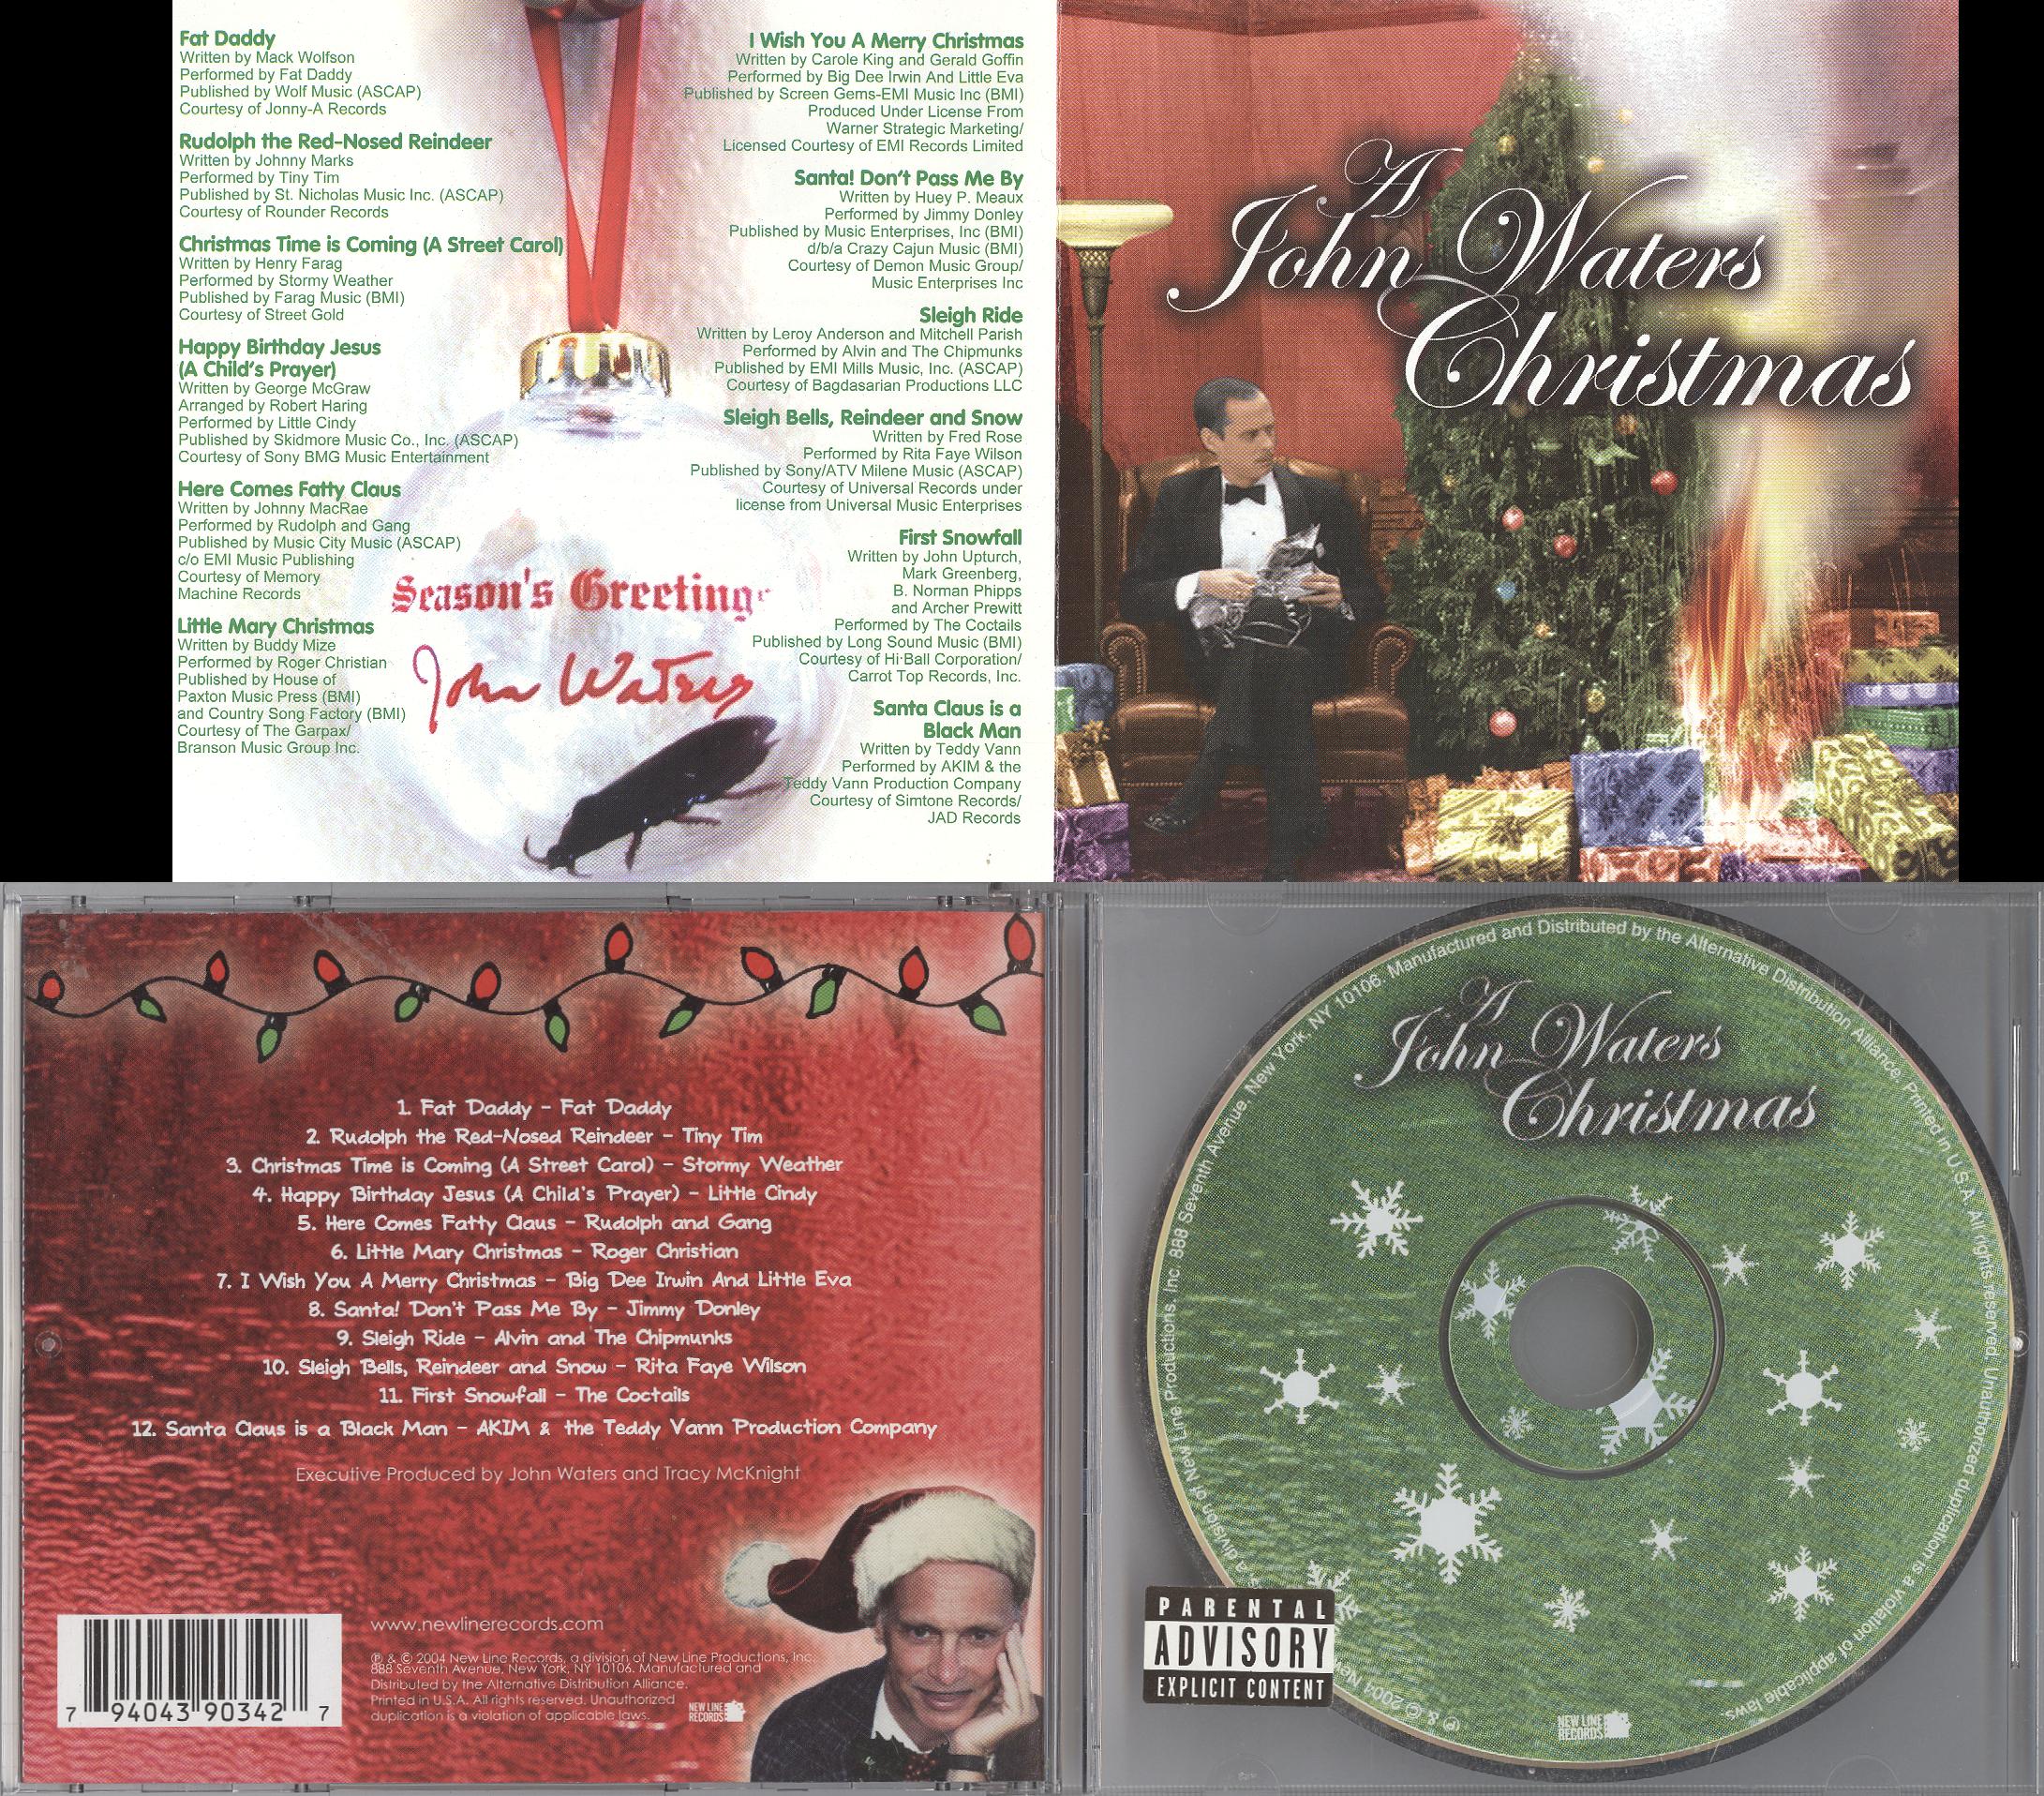 A John Waters Christmas, mylifeinconcert.com